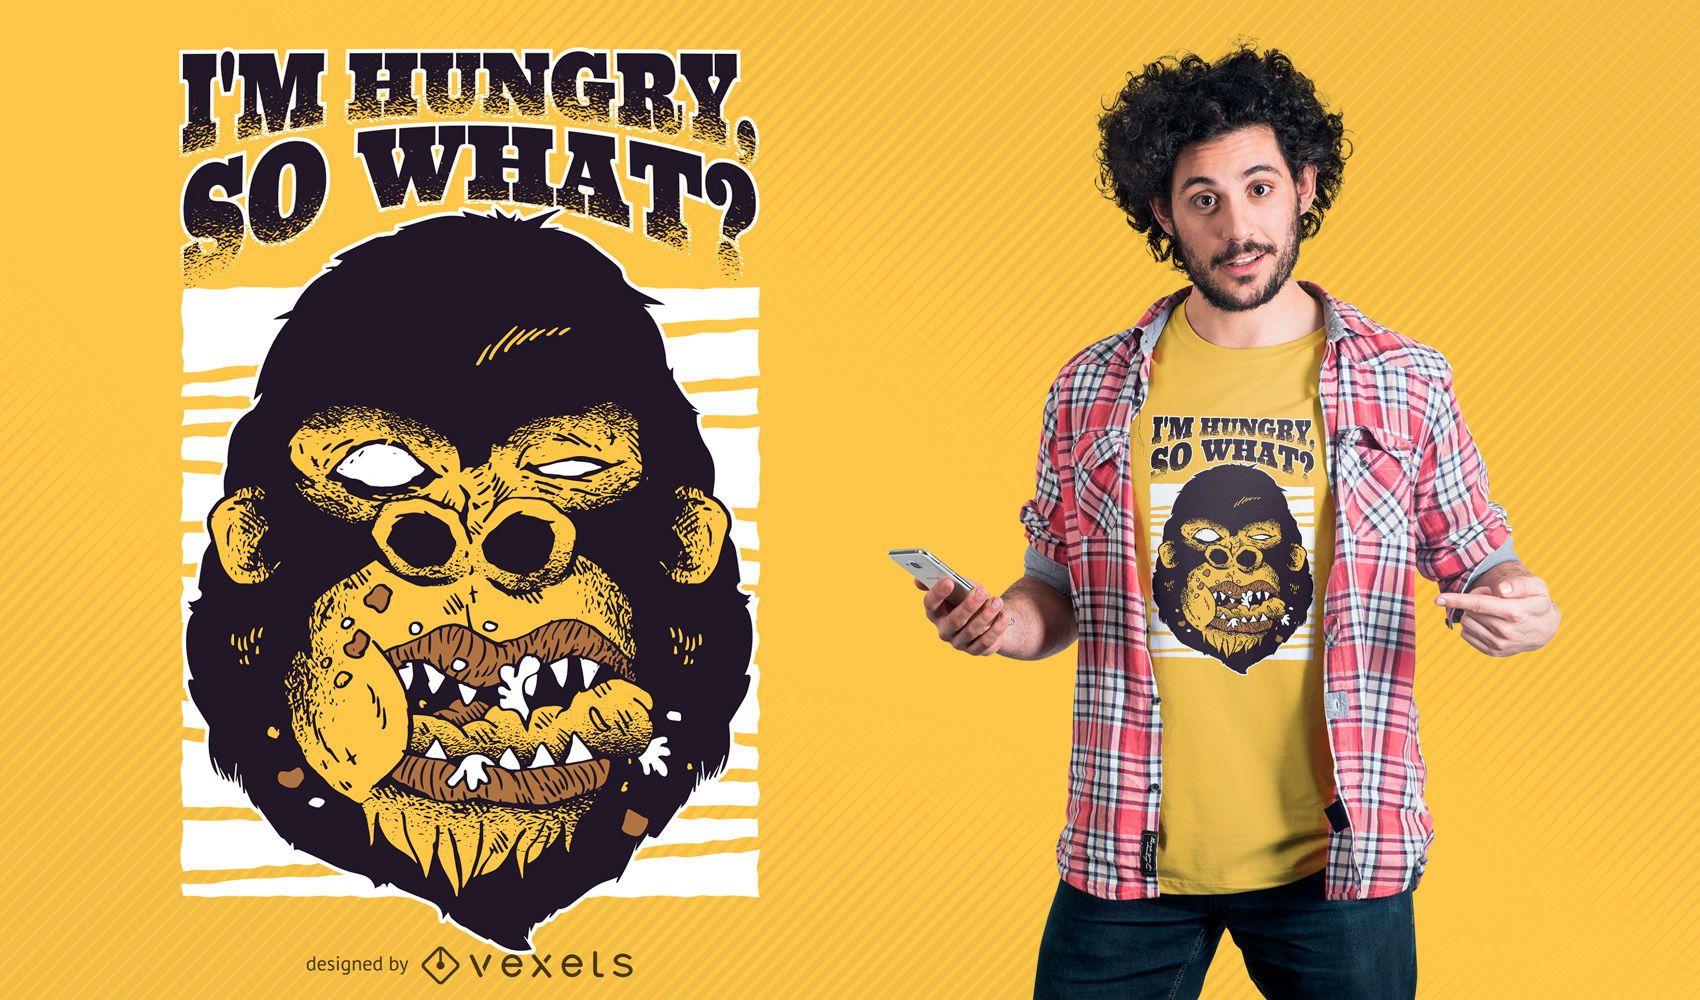 Gorila hambrienta camiseta de diseño. Descargar imagen grande 1700x1000px.  license image  user 270e0c322a799